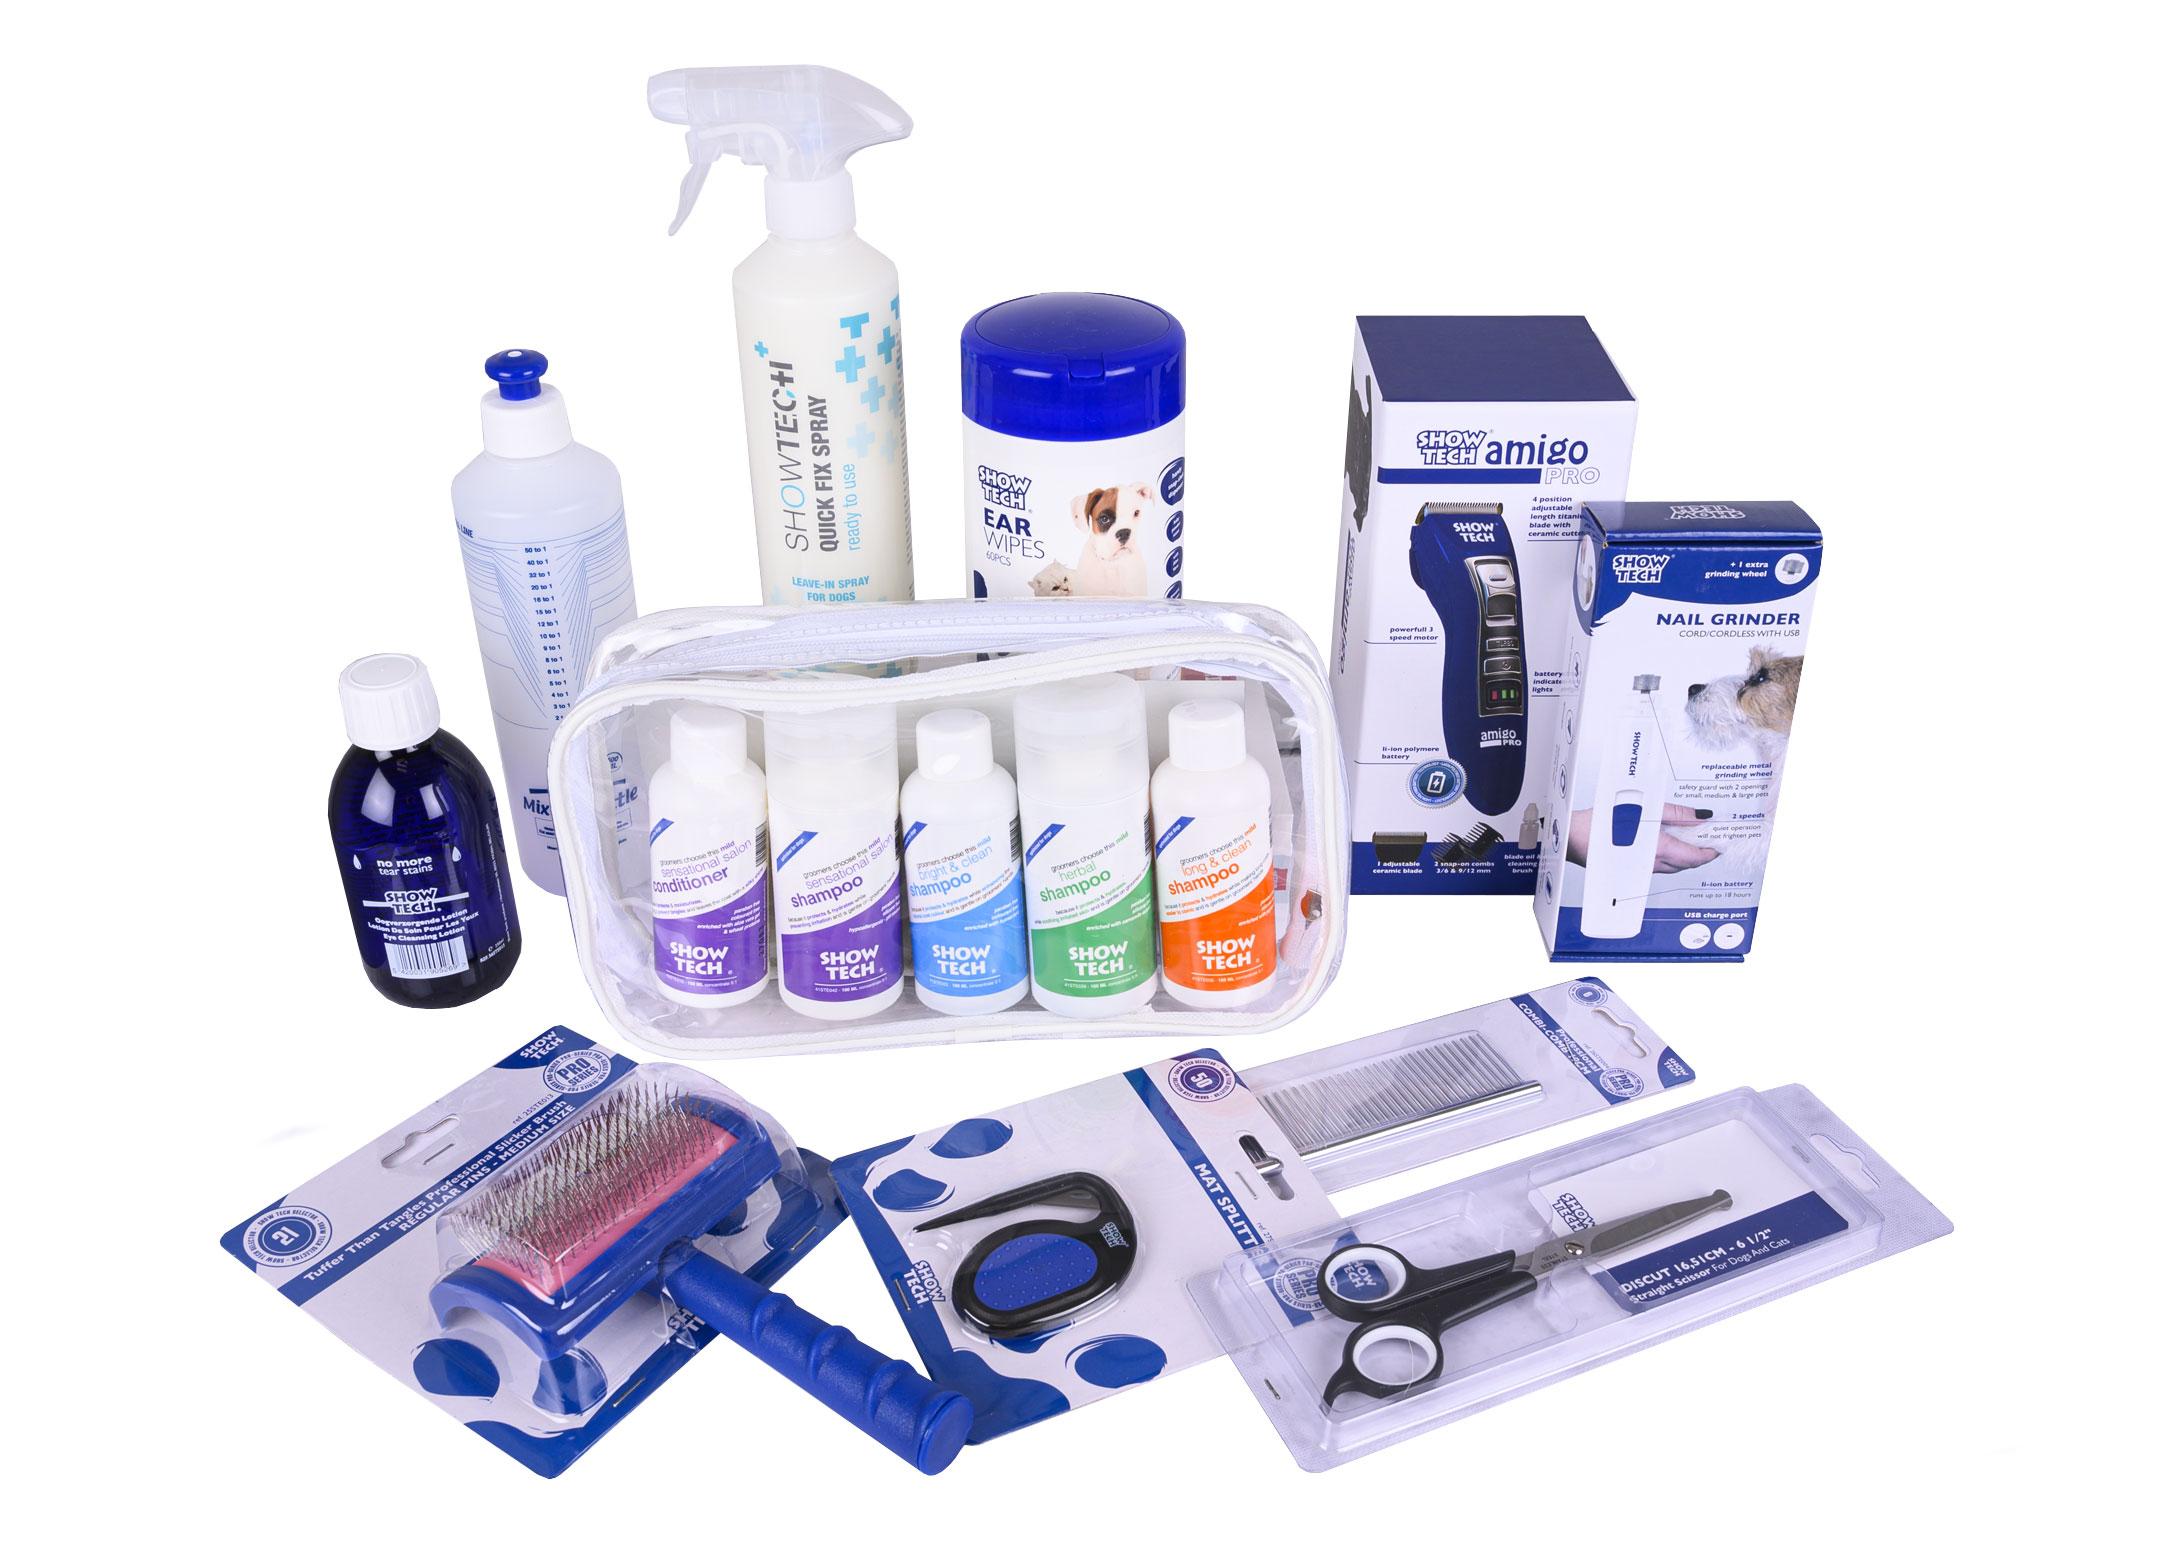 Show Tech Advanced Dog Care kit